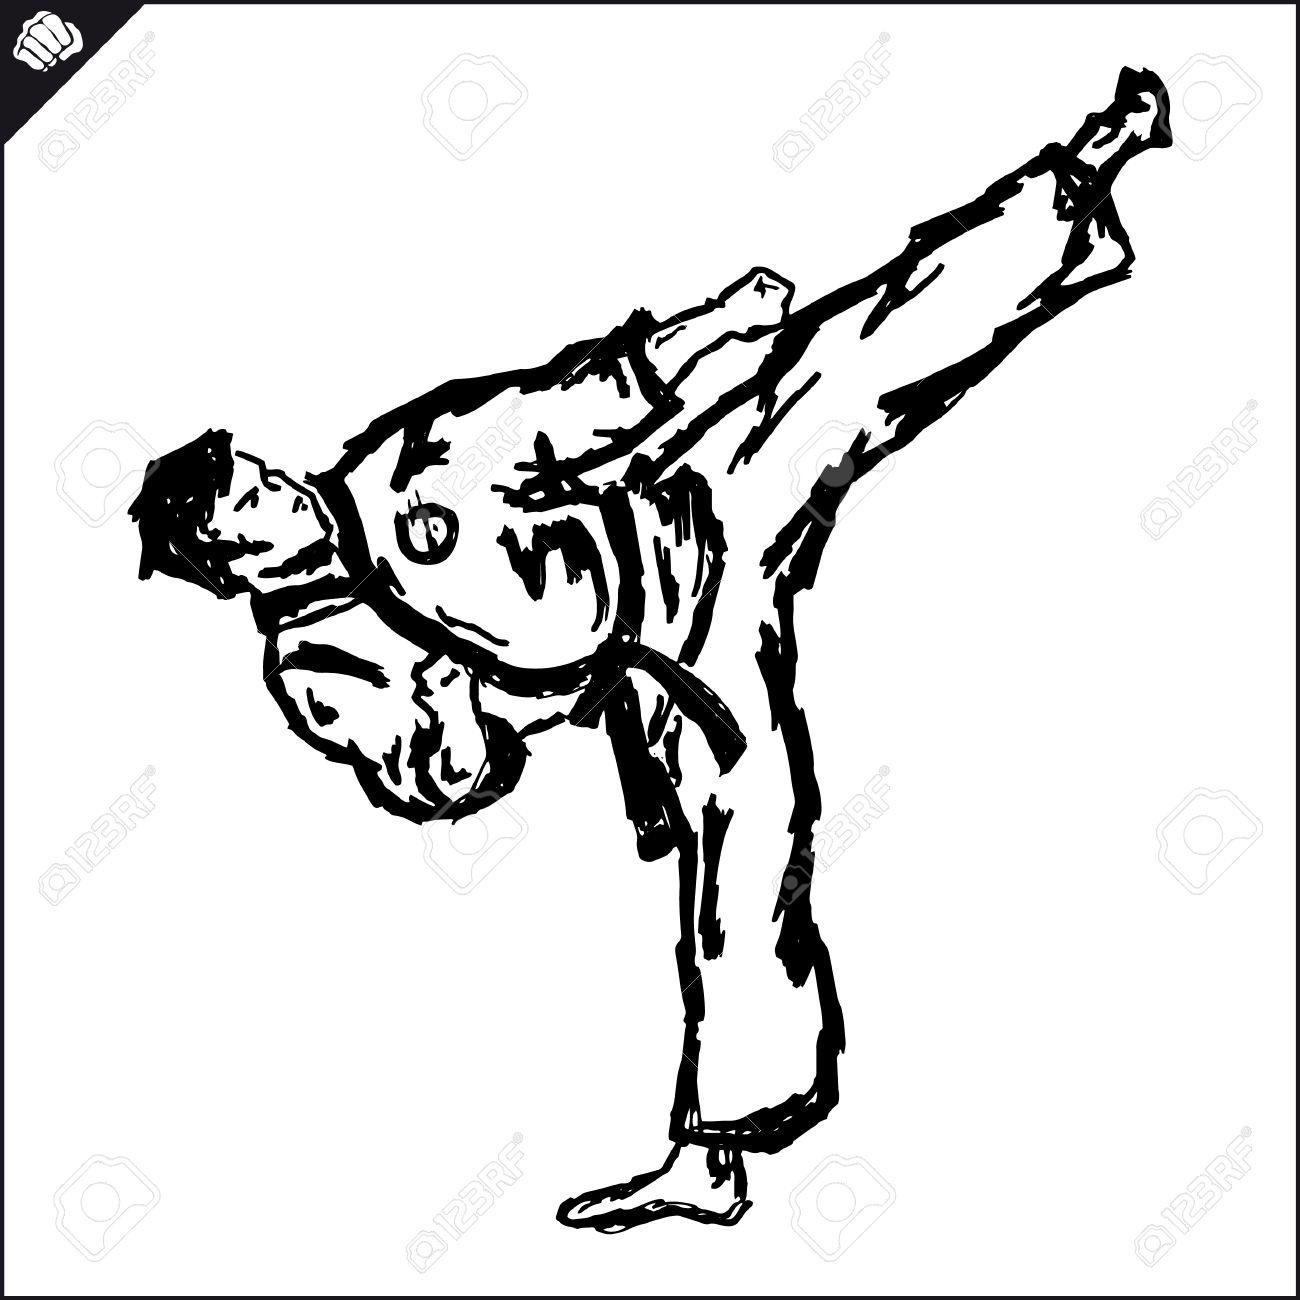 fighting arts karate taekwondo hapkido jiu jitsu royalty free rh 123rf com brazilian jiu jitsu clipart Cartoon Jiu Jitsu